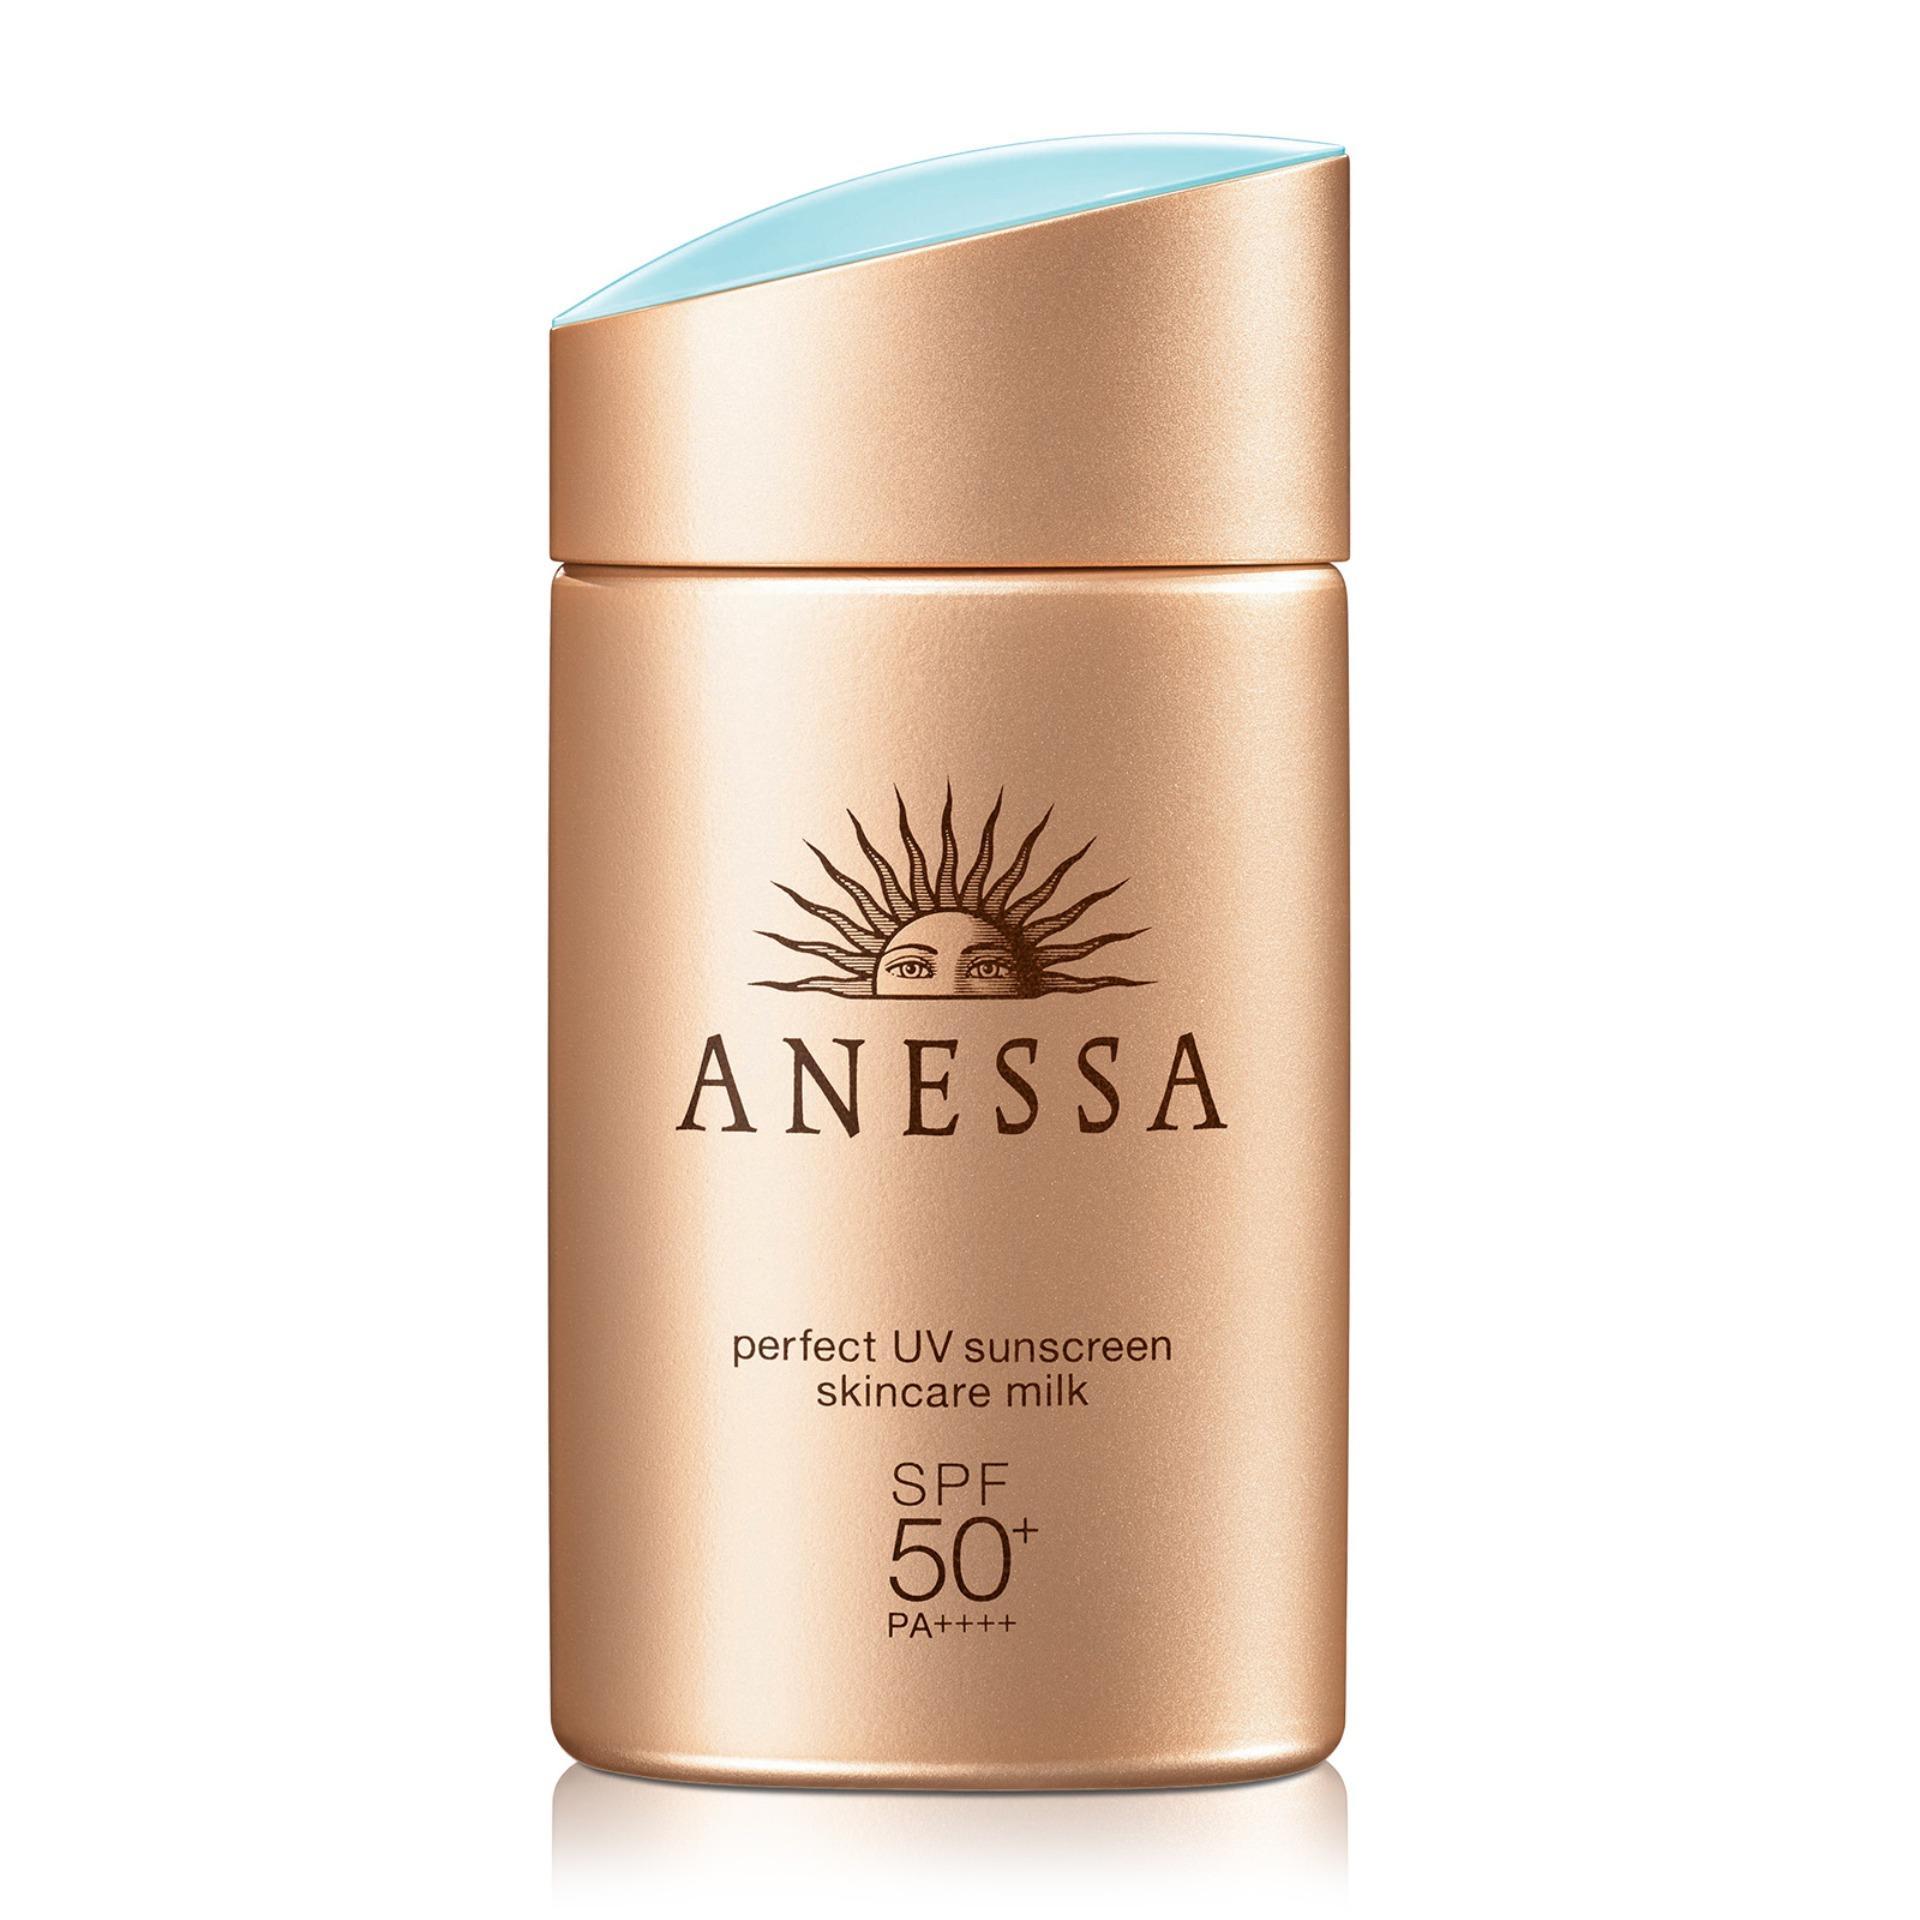 The New Price Of Atomy Sunscreen Spf 50 Beige 60ml And Update Sunblock Banana Boat Spf50 Anessa Perfect Uv Skincare Milk